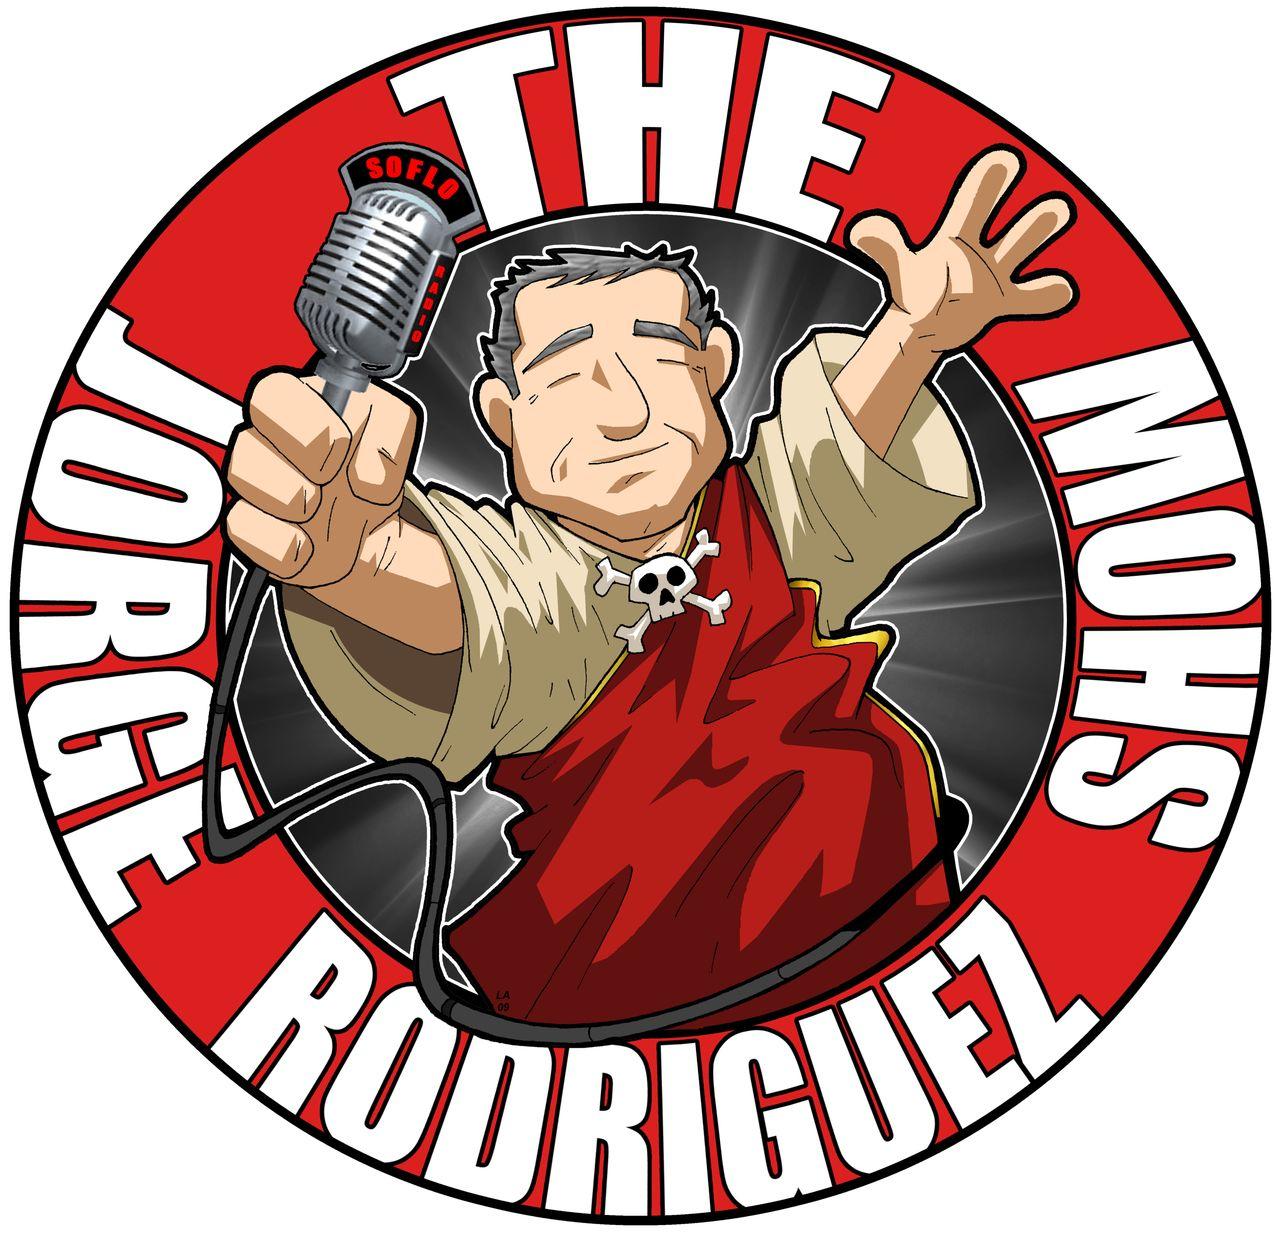 The Jorge Rodriguez Show 7-5-13